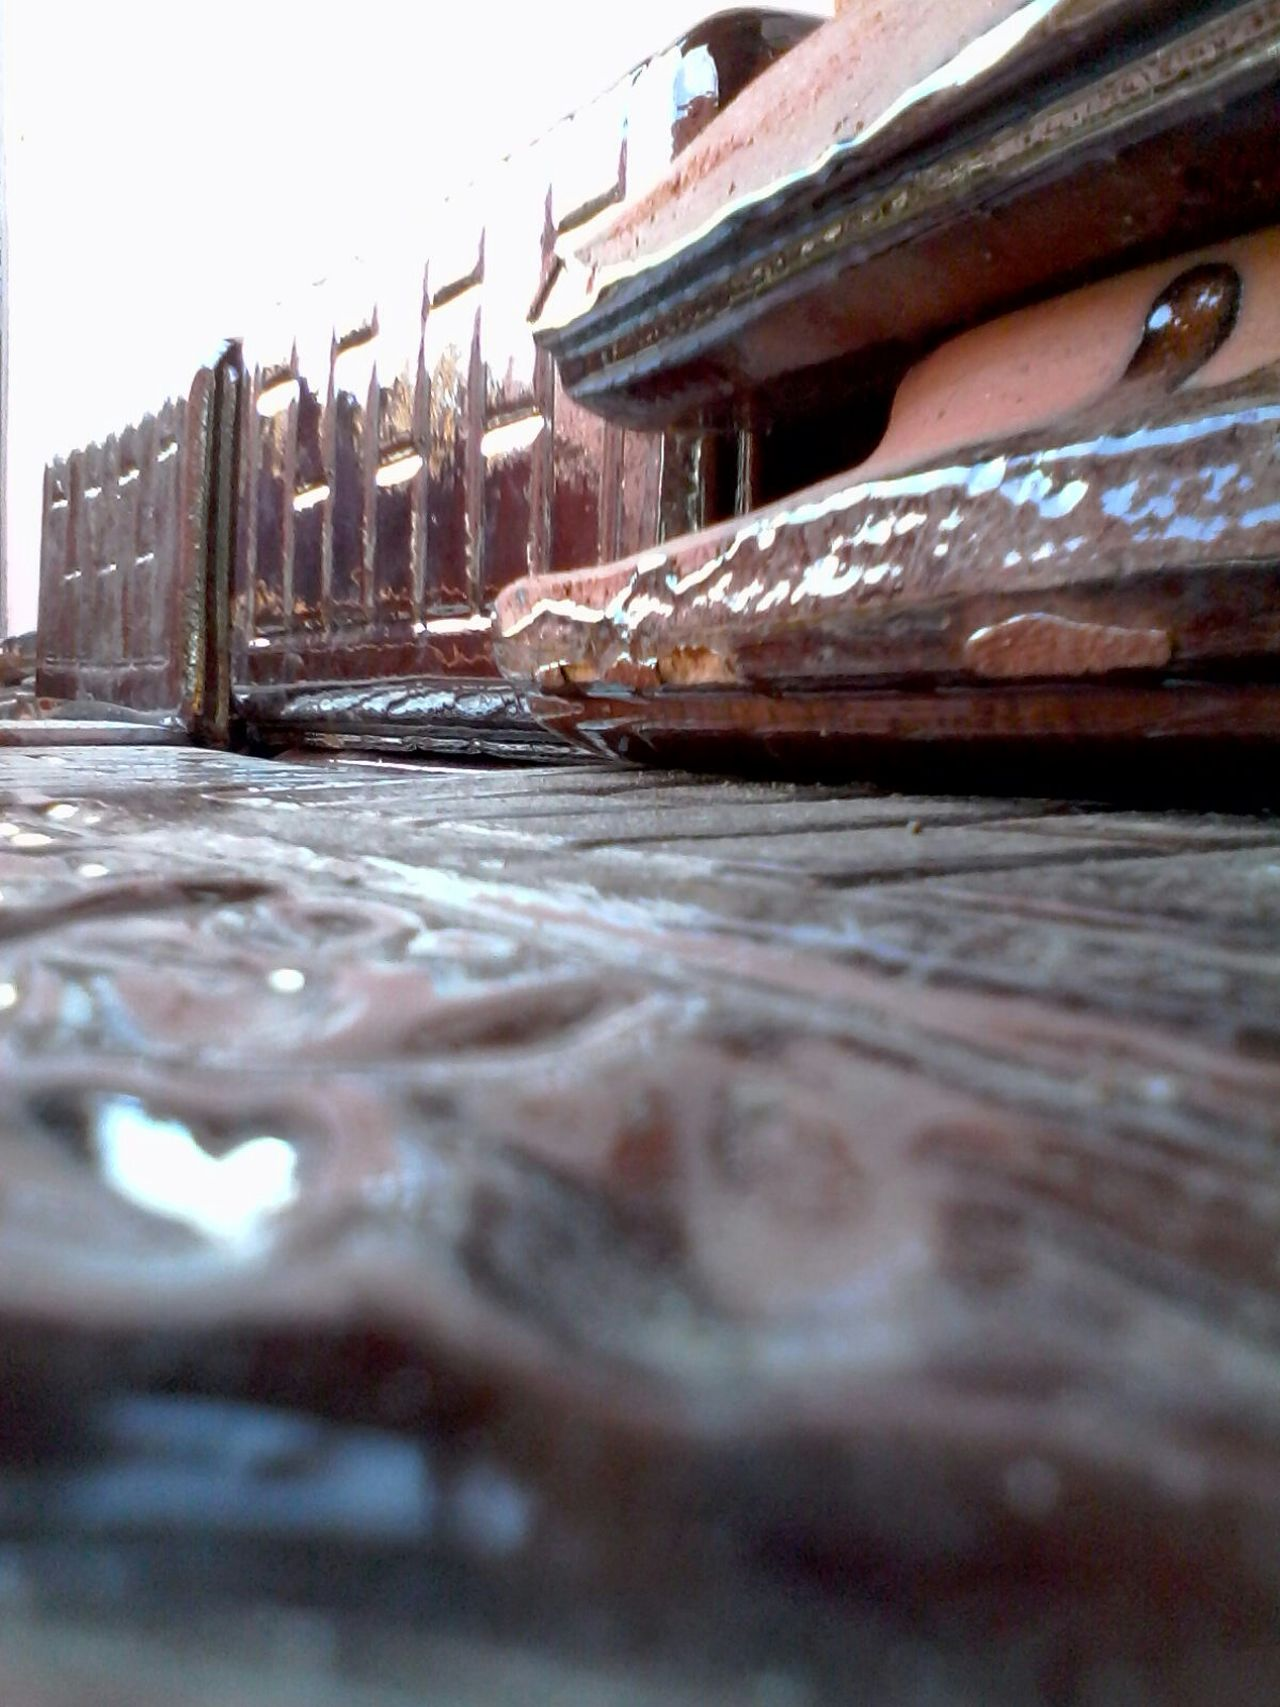 Bricks Closeup Unedited Ceramic Bricks Wolfzuachis Chimney Bricks Textures And Surfaces Eyeem Market